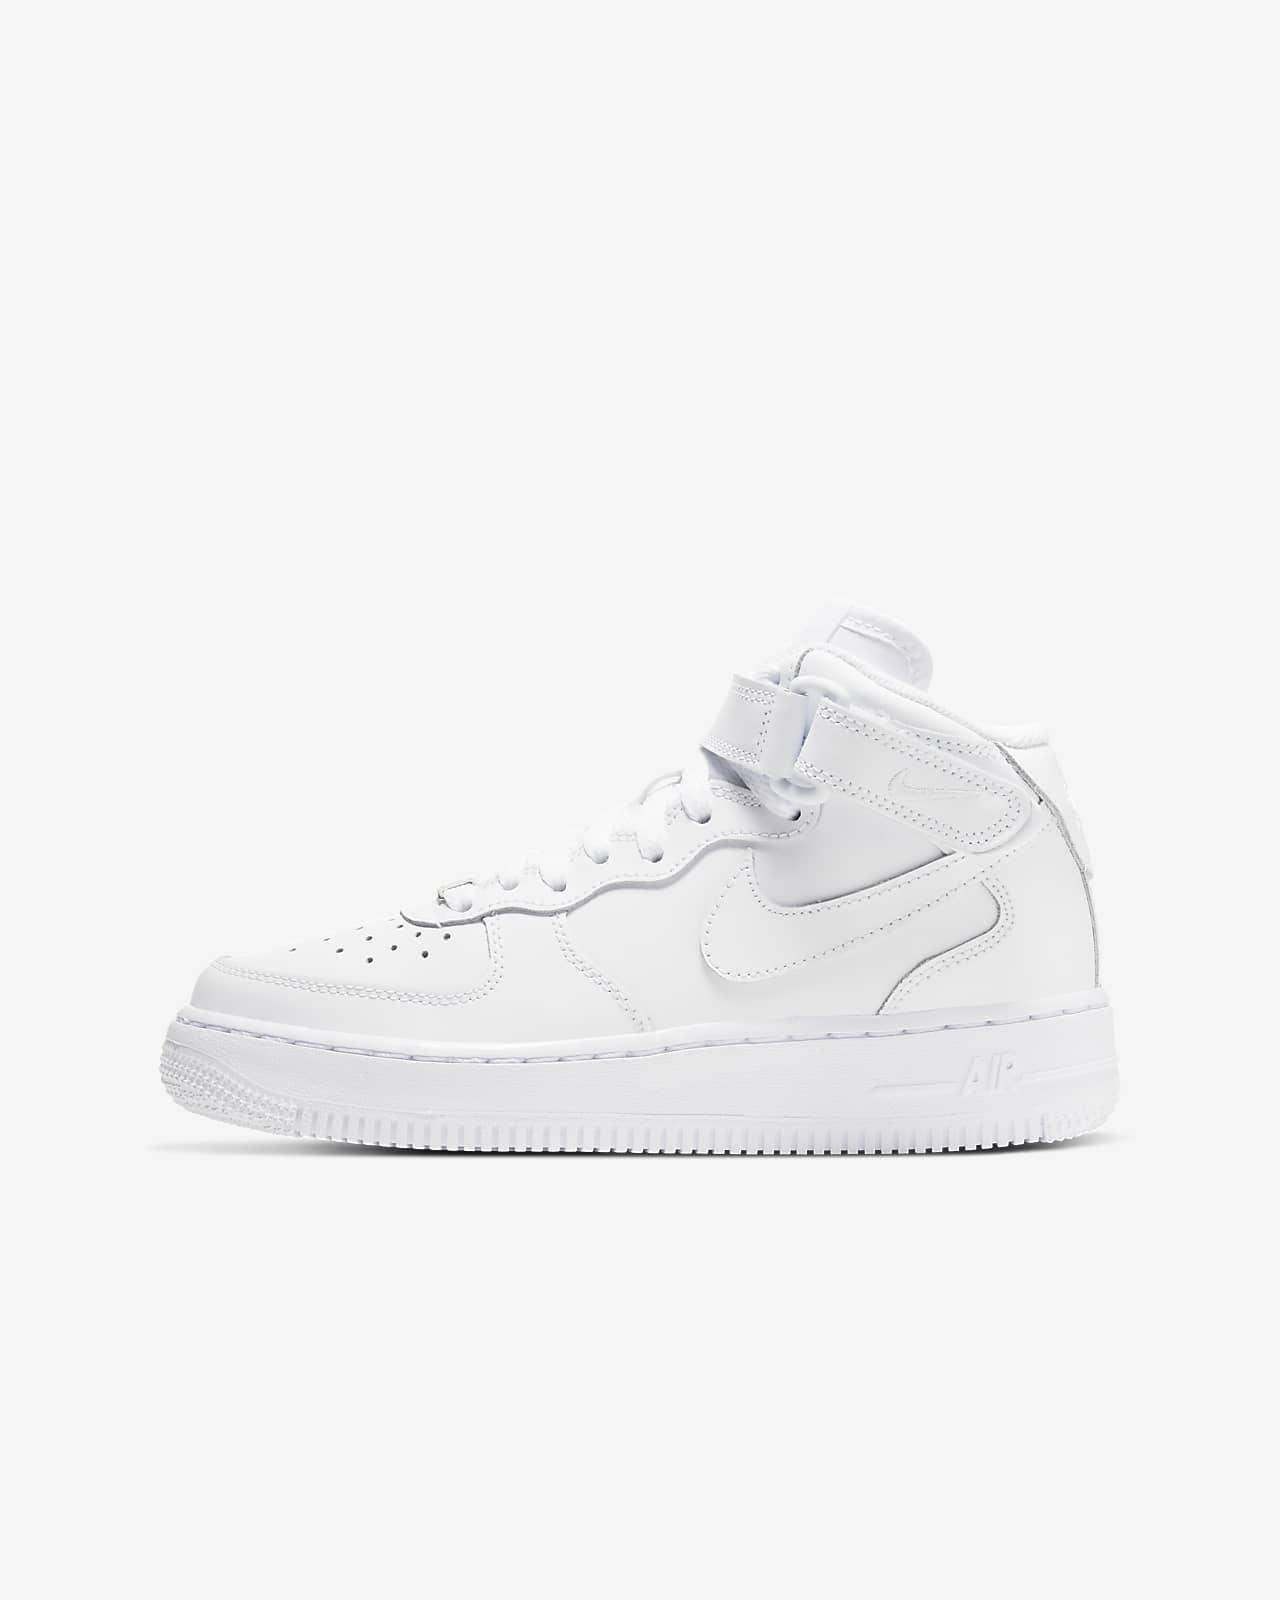 Calzado para niños talla grande Nike Air Force 1 Mid